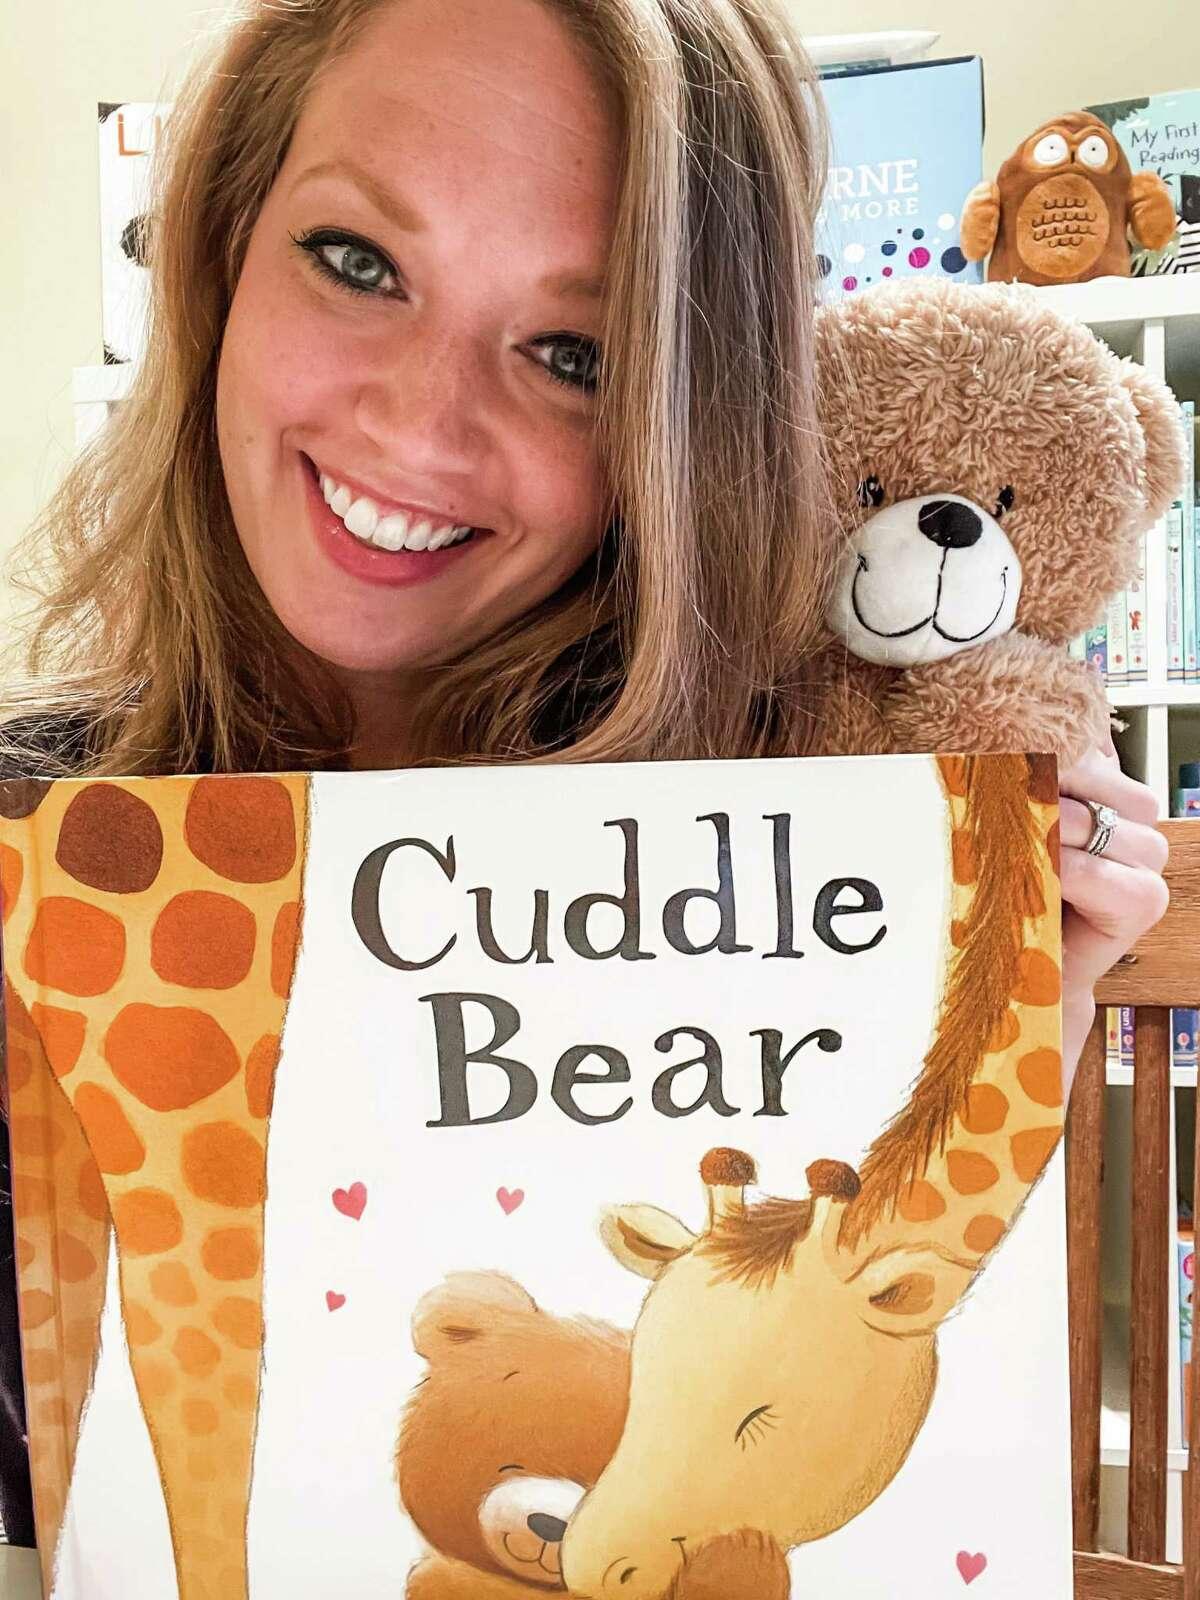 Brunetto started working with UK-based Usborne Books last year, the publisher of Cuddle Bear.